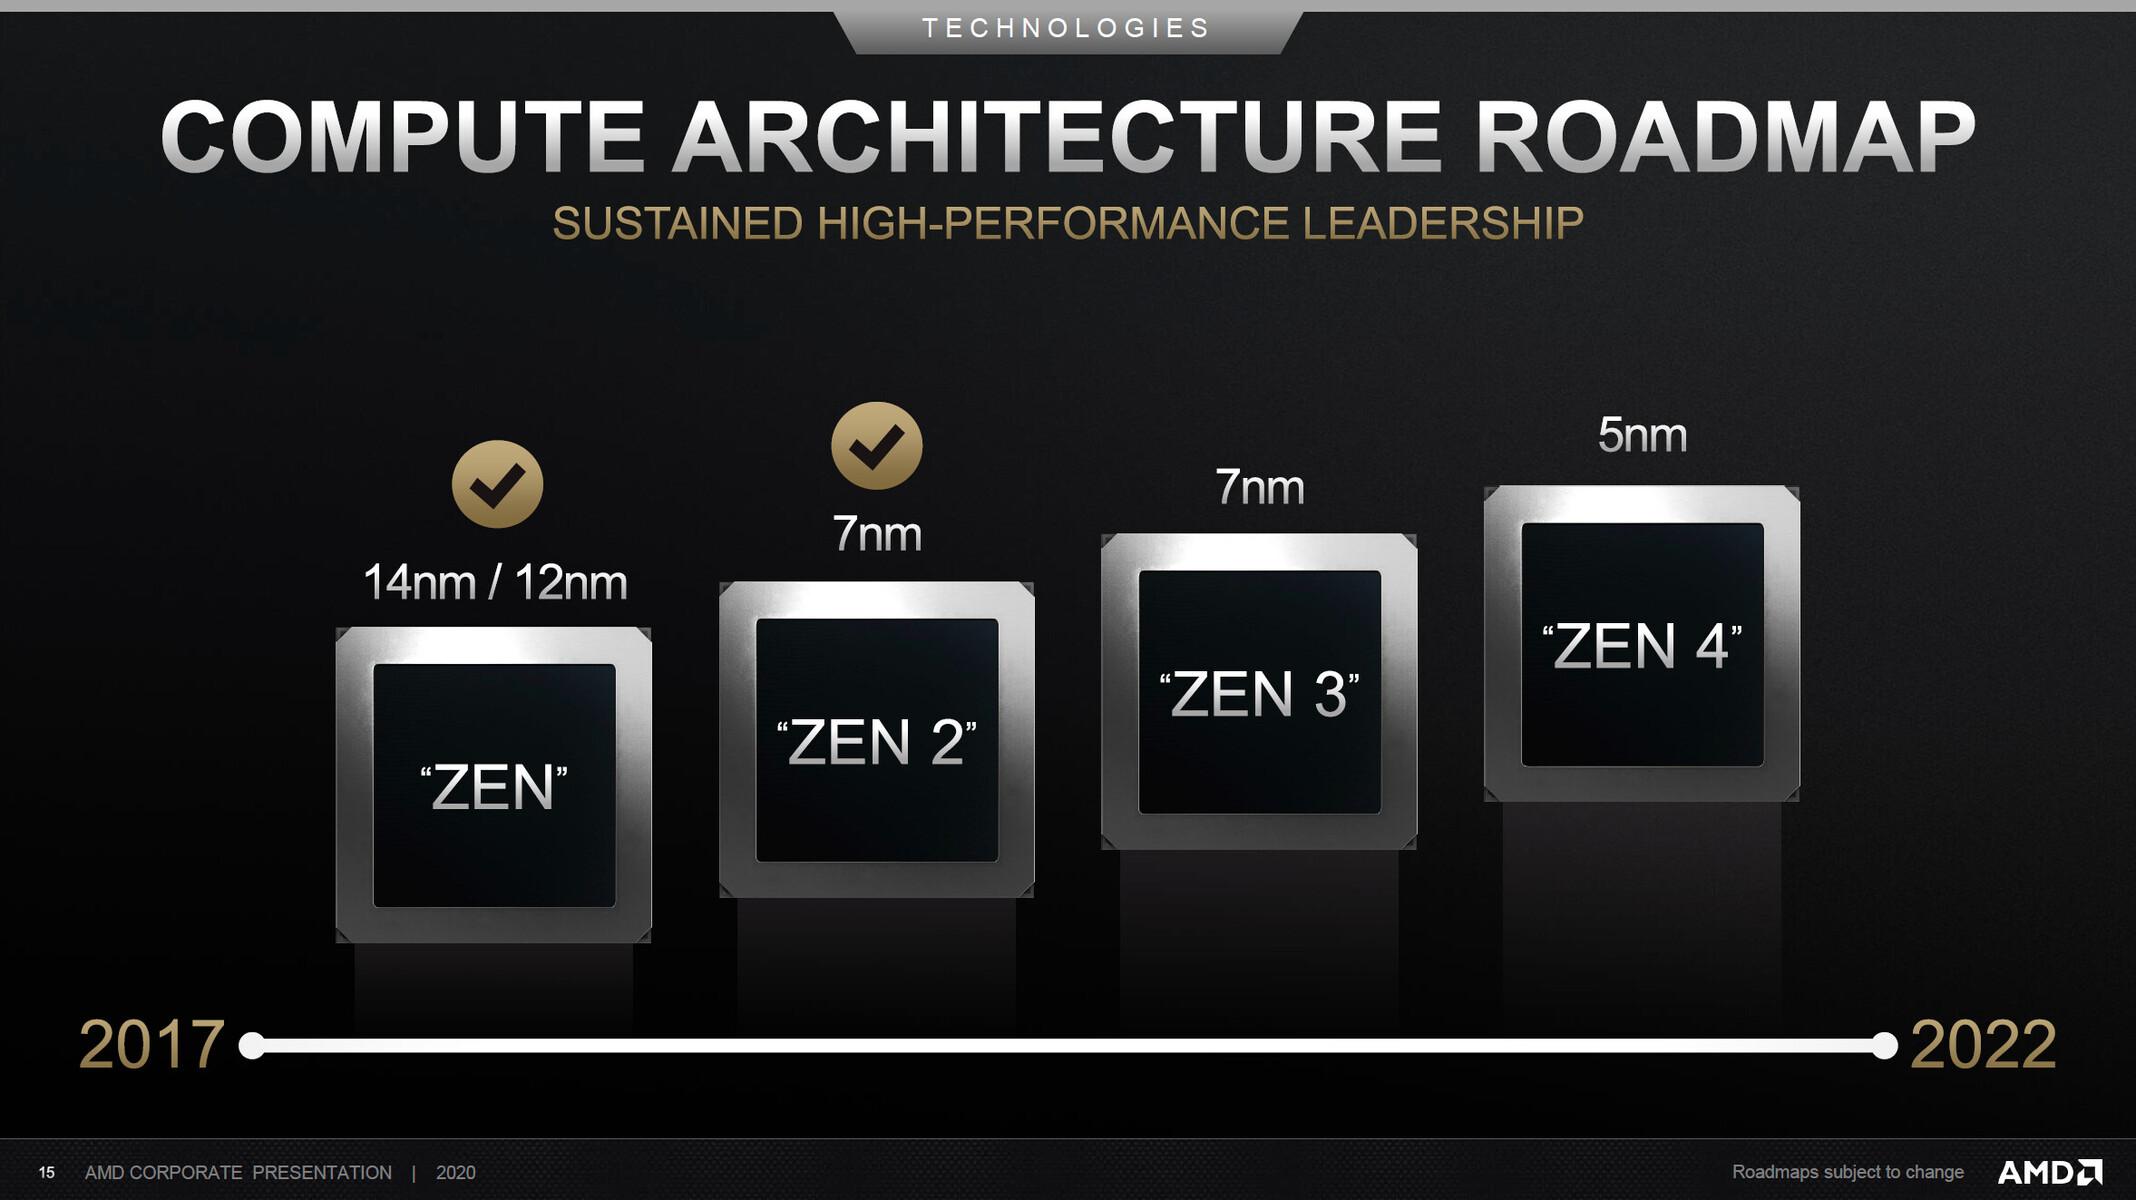 jzrbtz2lxwvclafs AMD ยืนยันเตรียมพร้อมเปิดตัวซีพียู ZEN4 และการ์ดจอ RDNA3 สถาปัตย์ขนาด 5nm ในปี 2022 อย่างแน่นอน